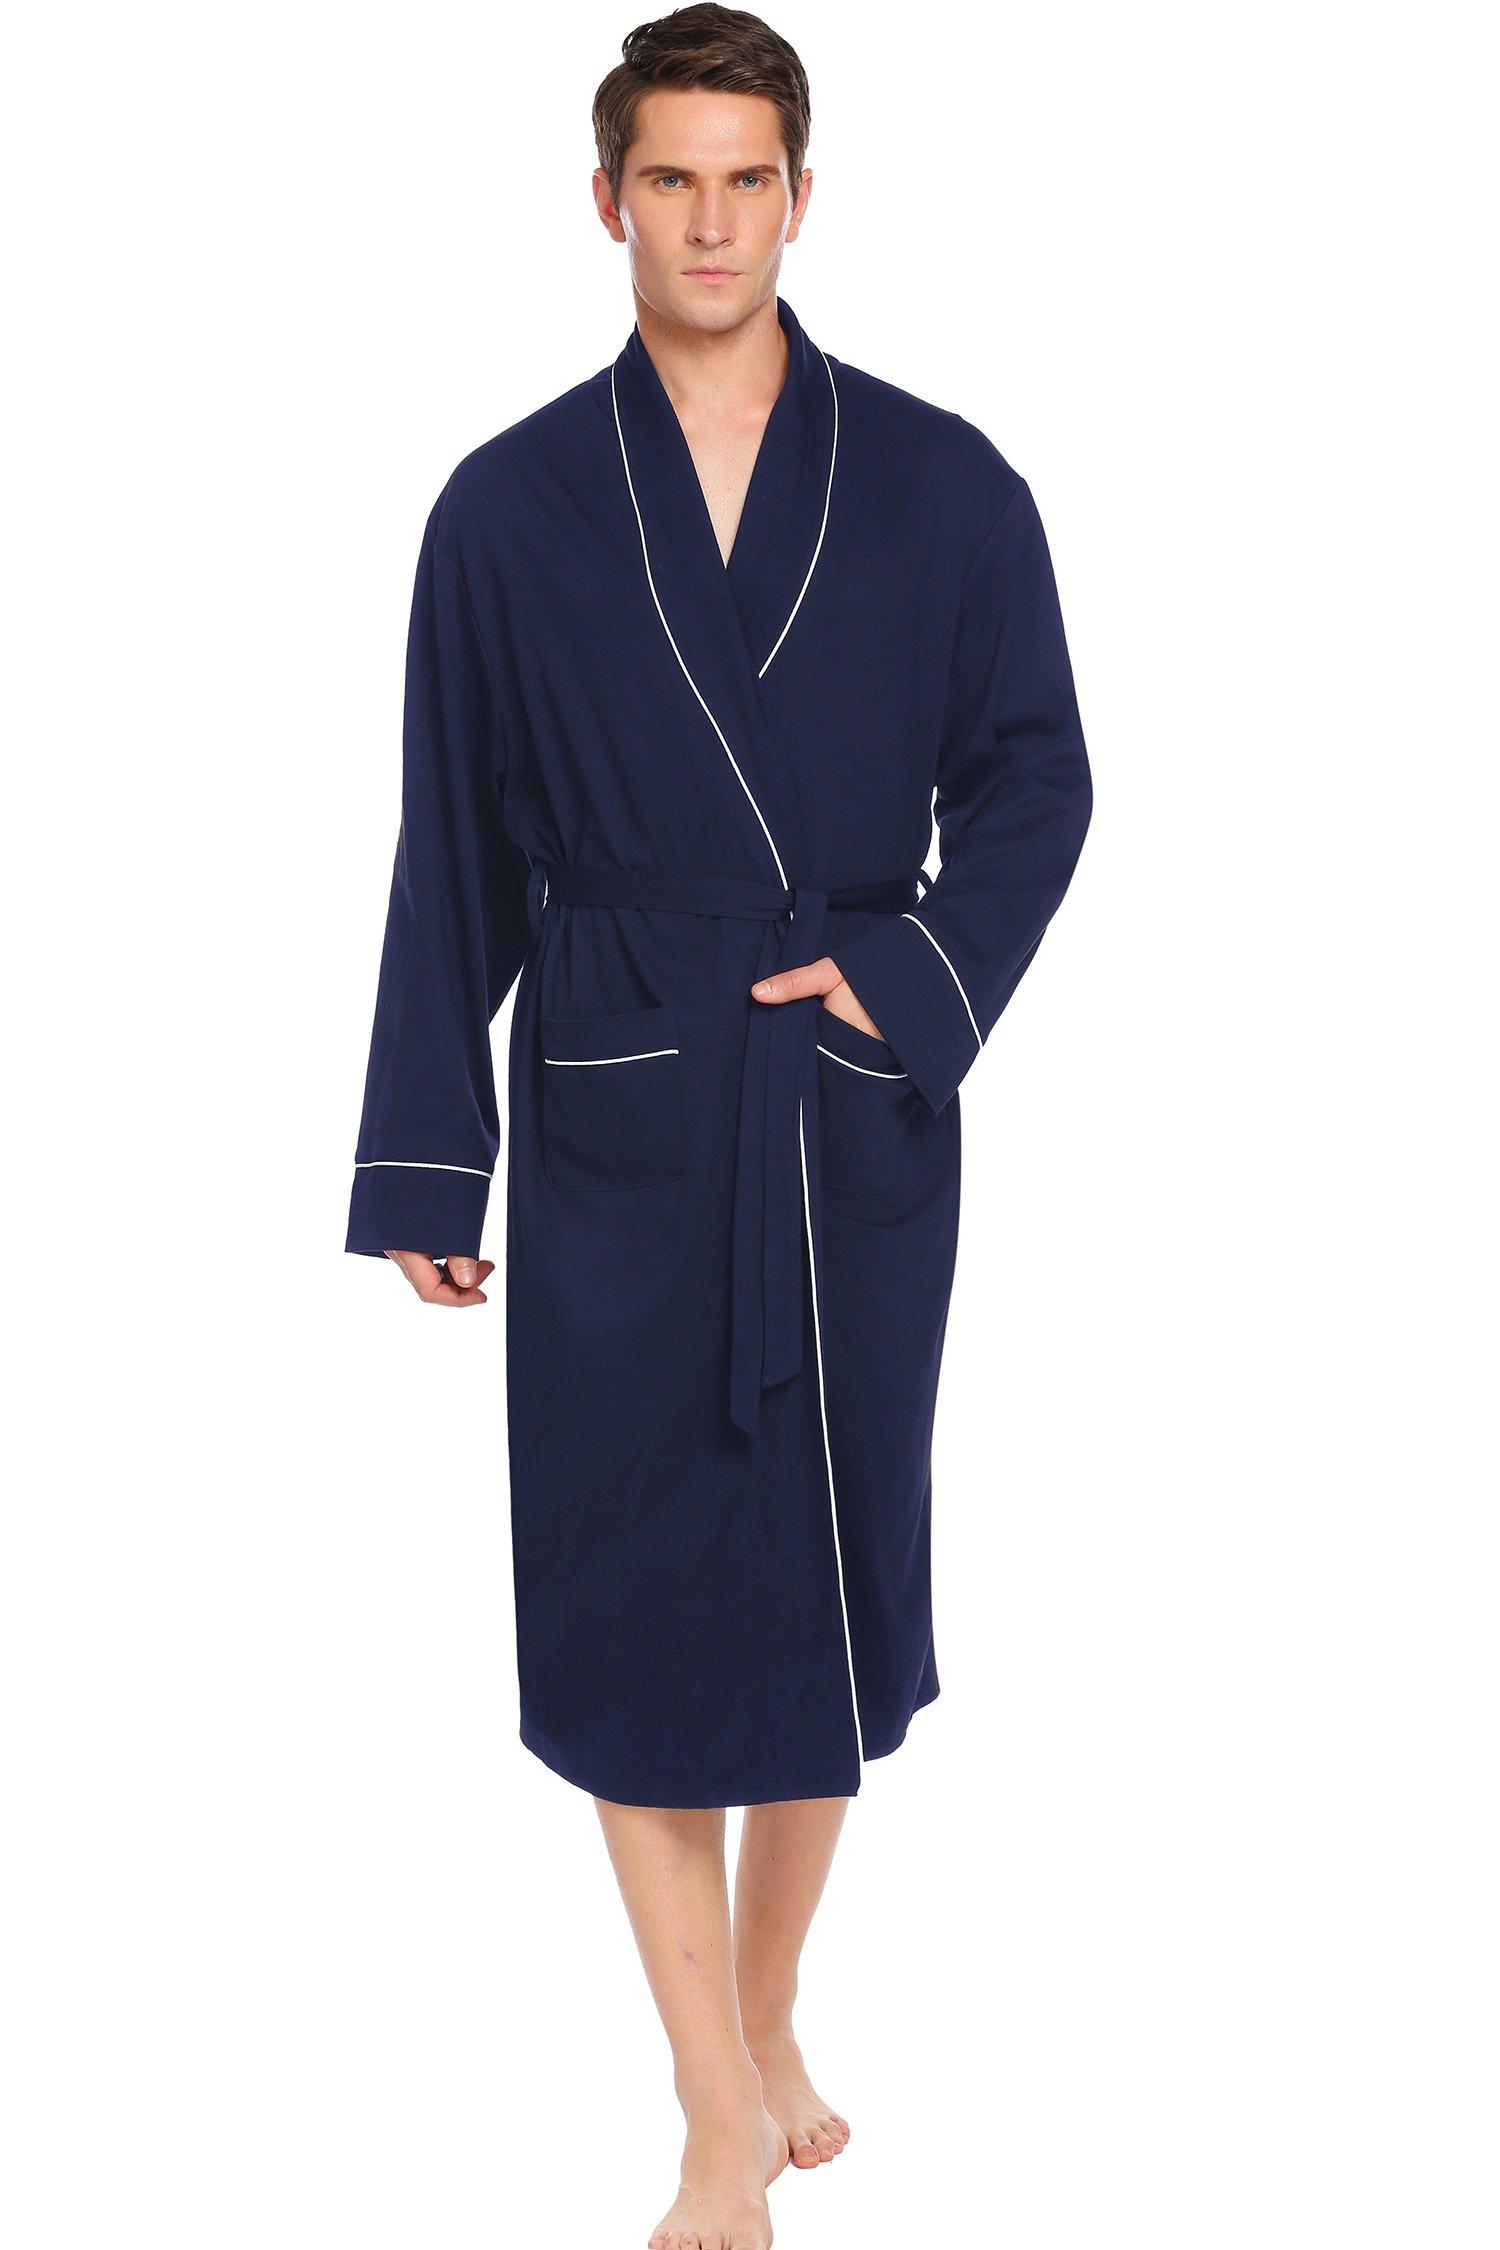 Ekouaer Robes, Lightweight Bathrobe Long Sleeve Robe Sleepwear (Navy, X-Large)